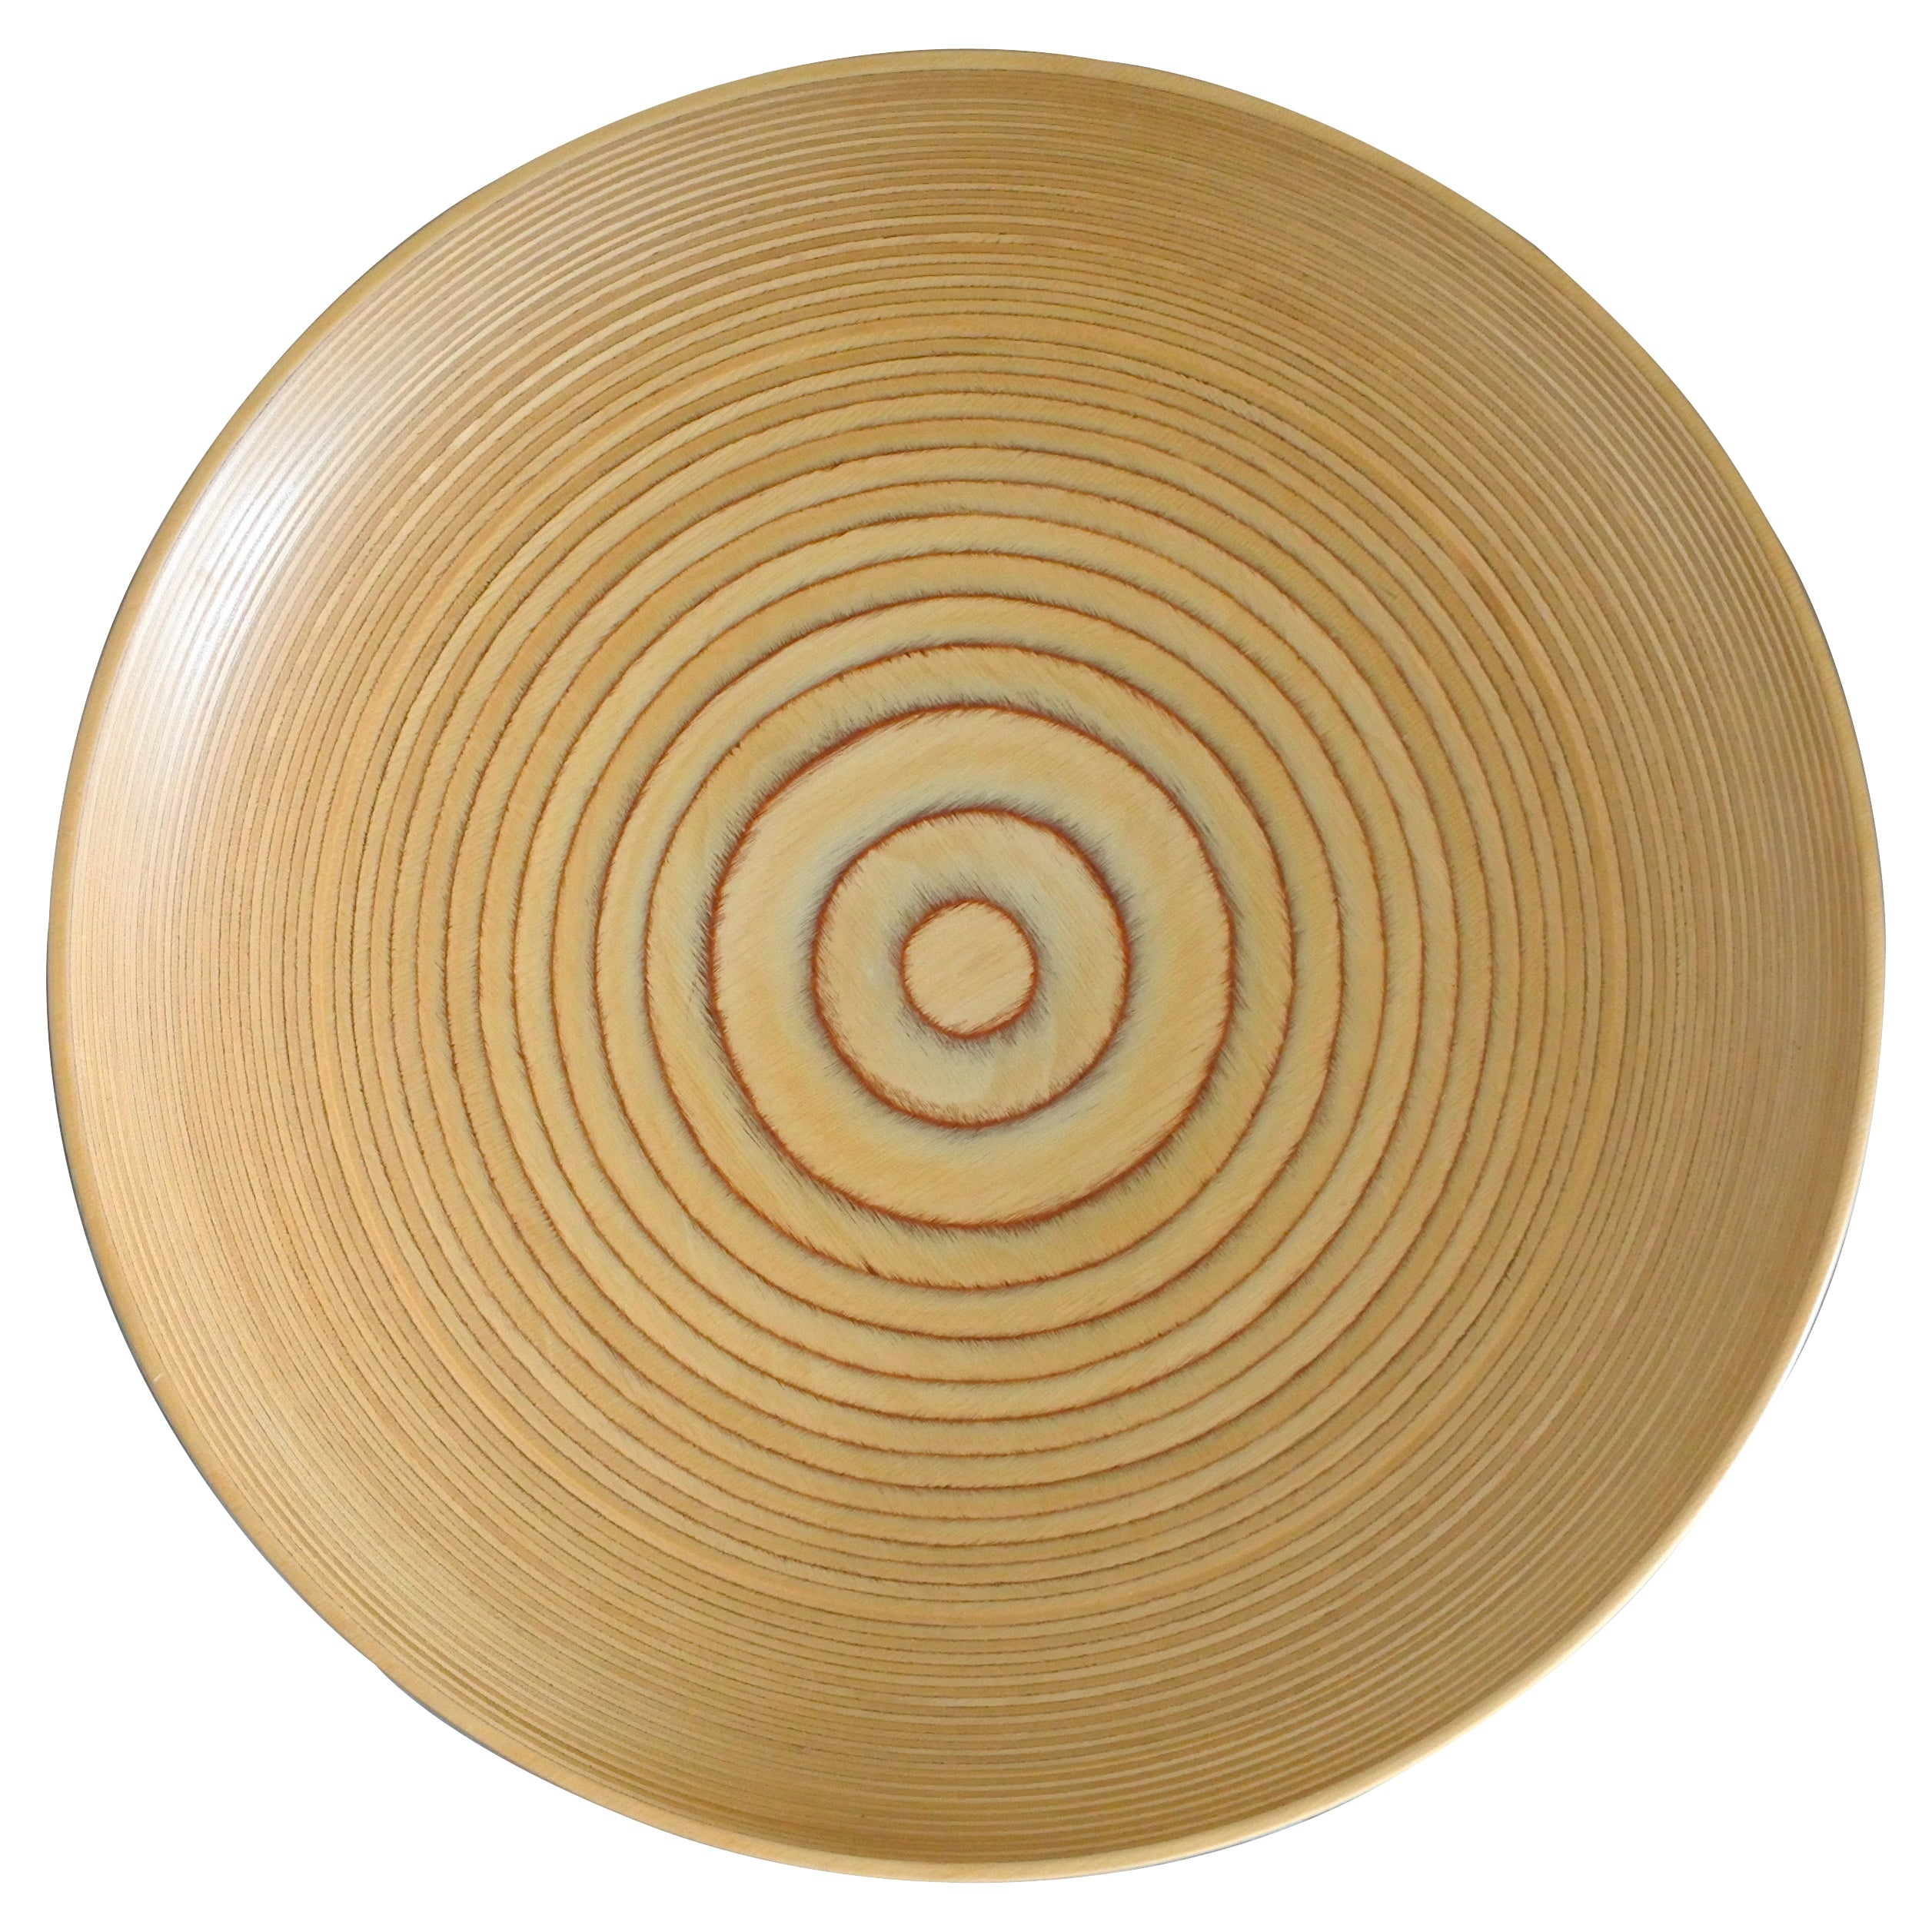 XL Birch Plywood Tray by Saarinen, Finland